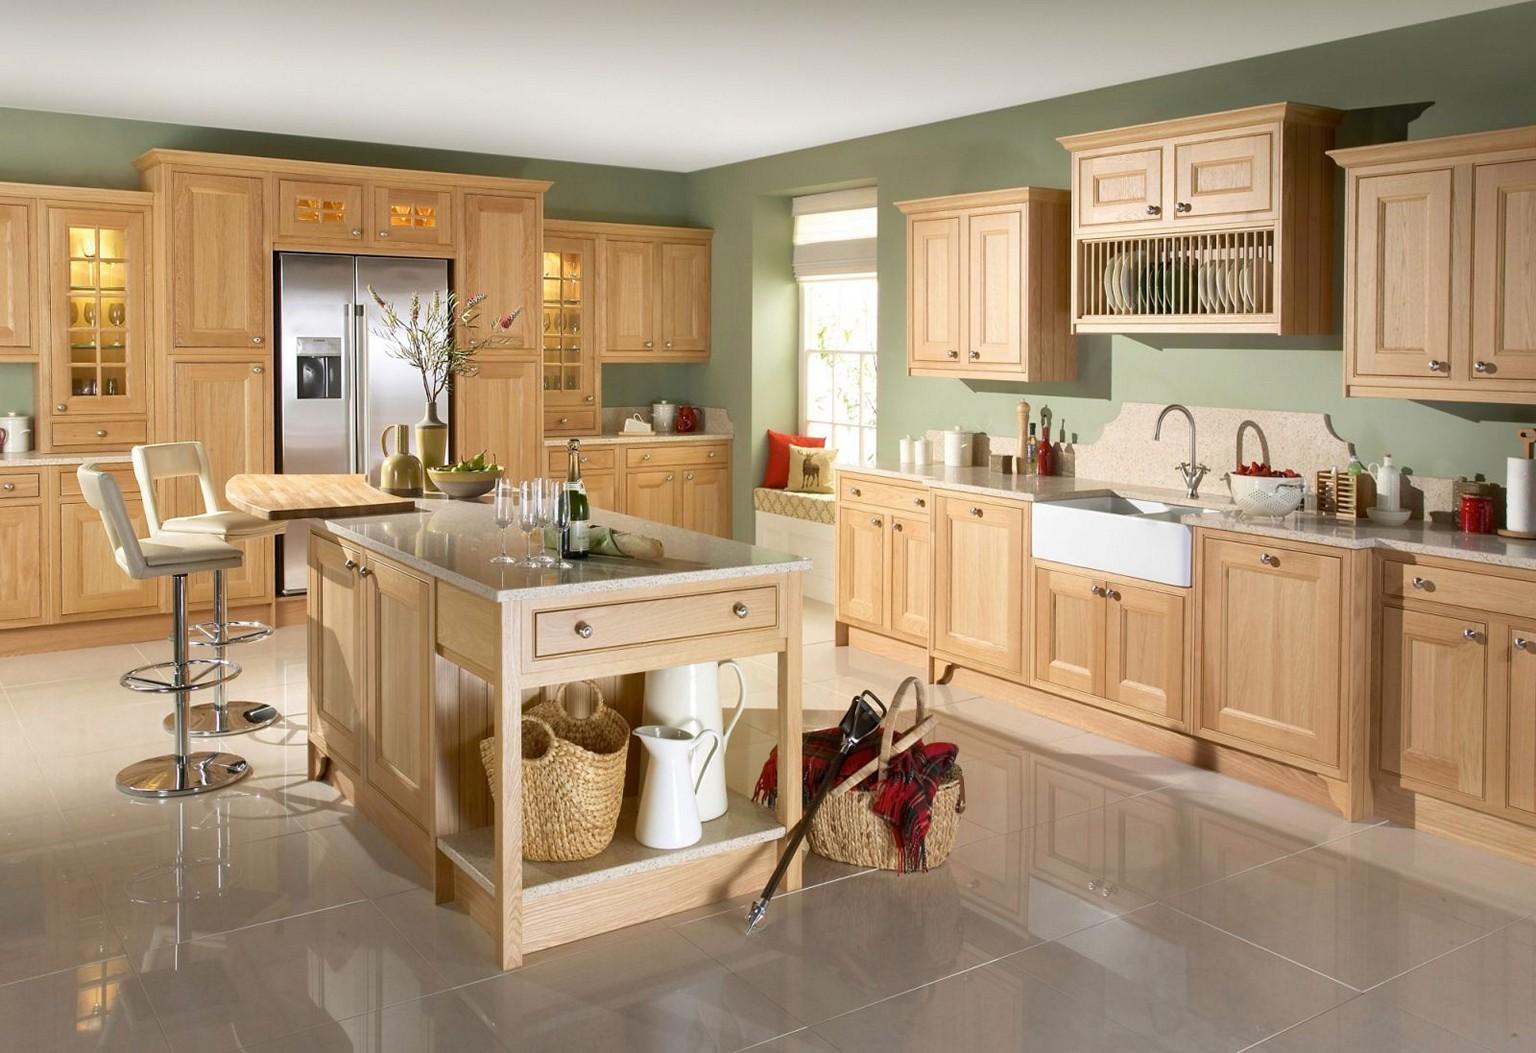 Charming Natural Oak Kitchen Cabinet Smart Online Kitchen Design